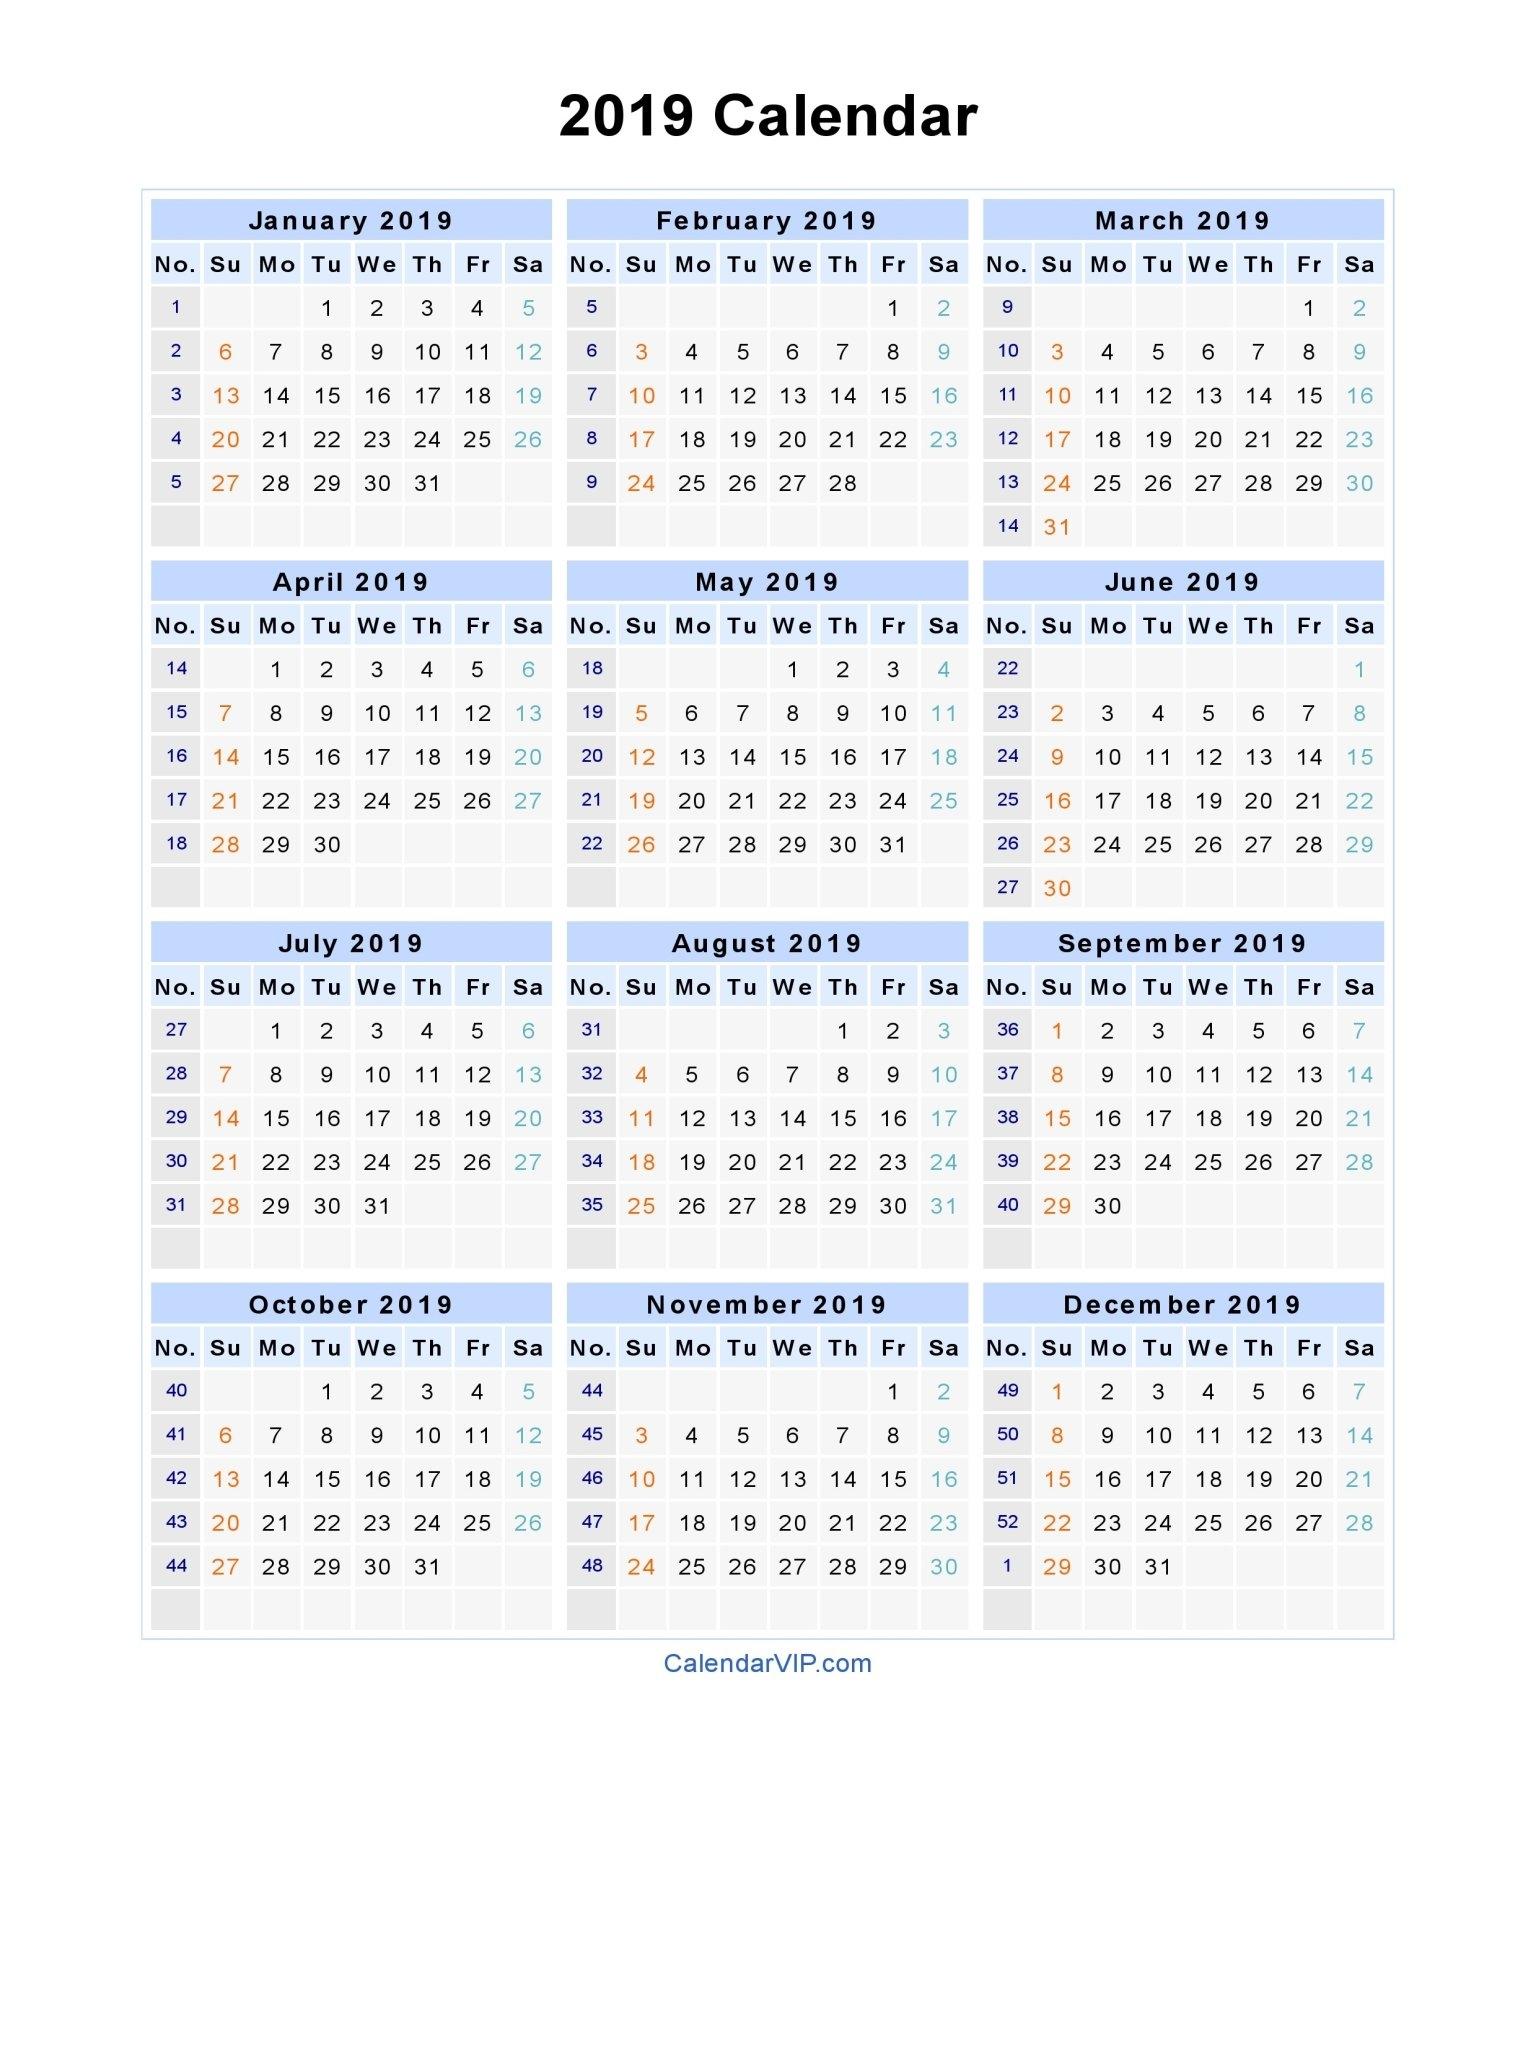 2019 Calendar - Blank Printable Calendar Template In Pdf Word Excel Calendar 2019 Excel Editable